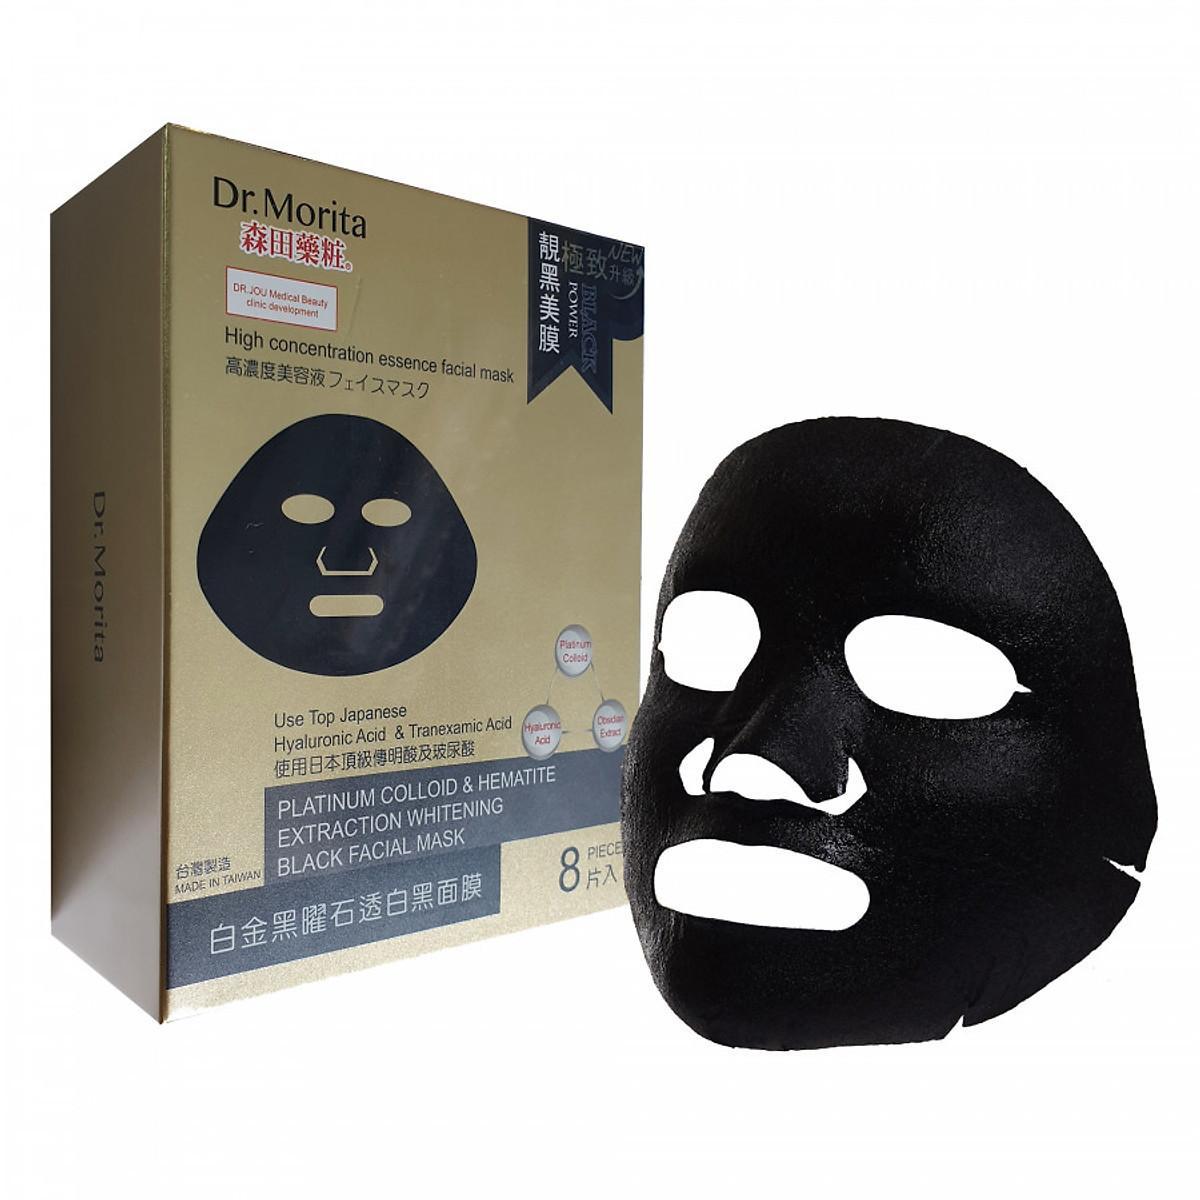 Đánh giá Morita Platinum Colloid & Hematite Extration Whitening Black Facial Mask